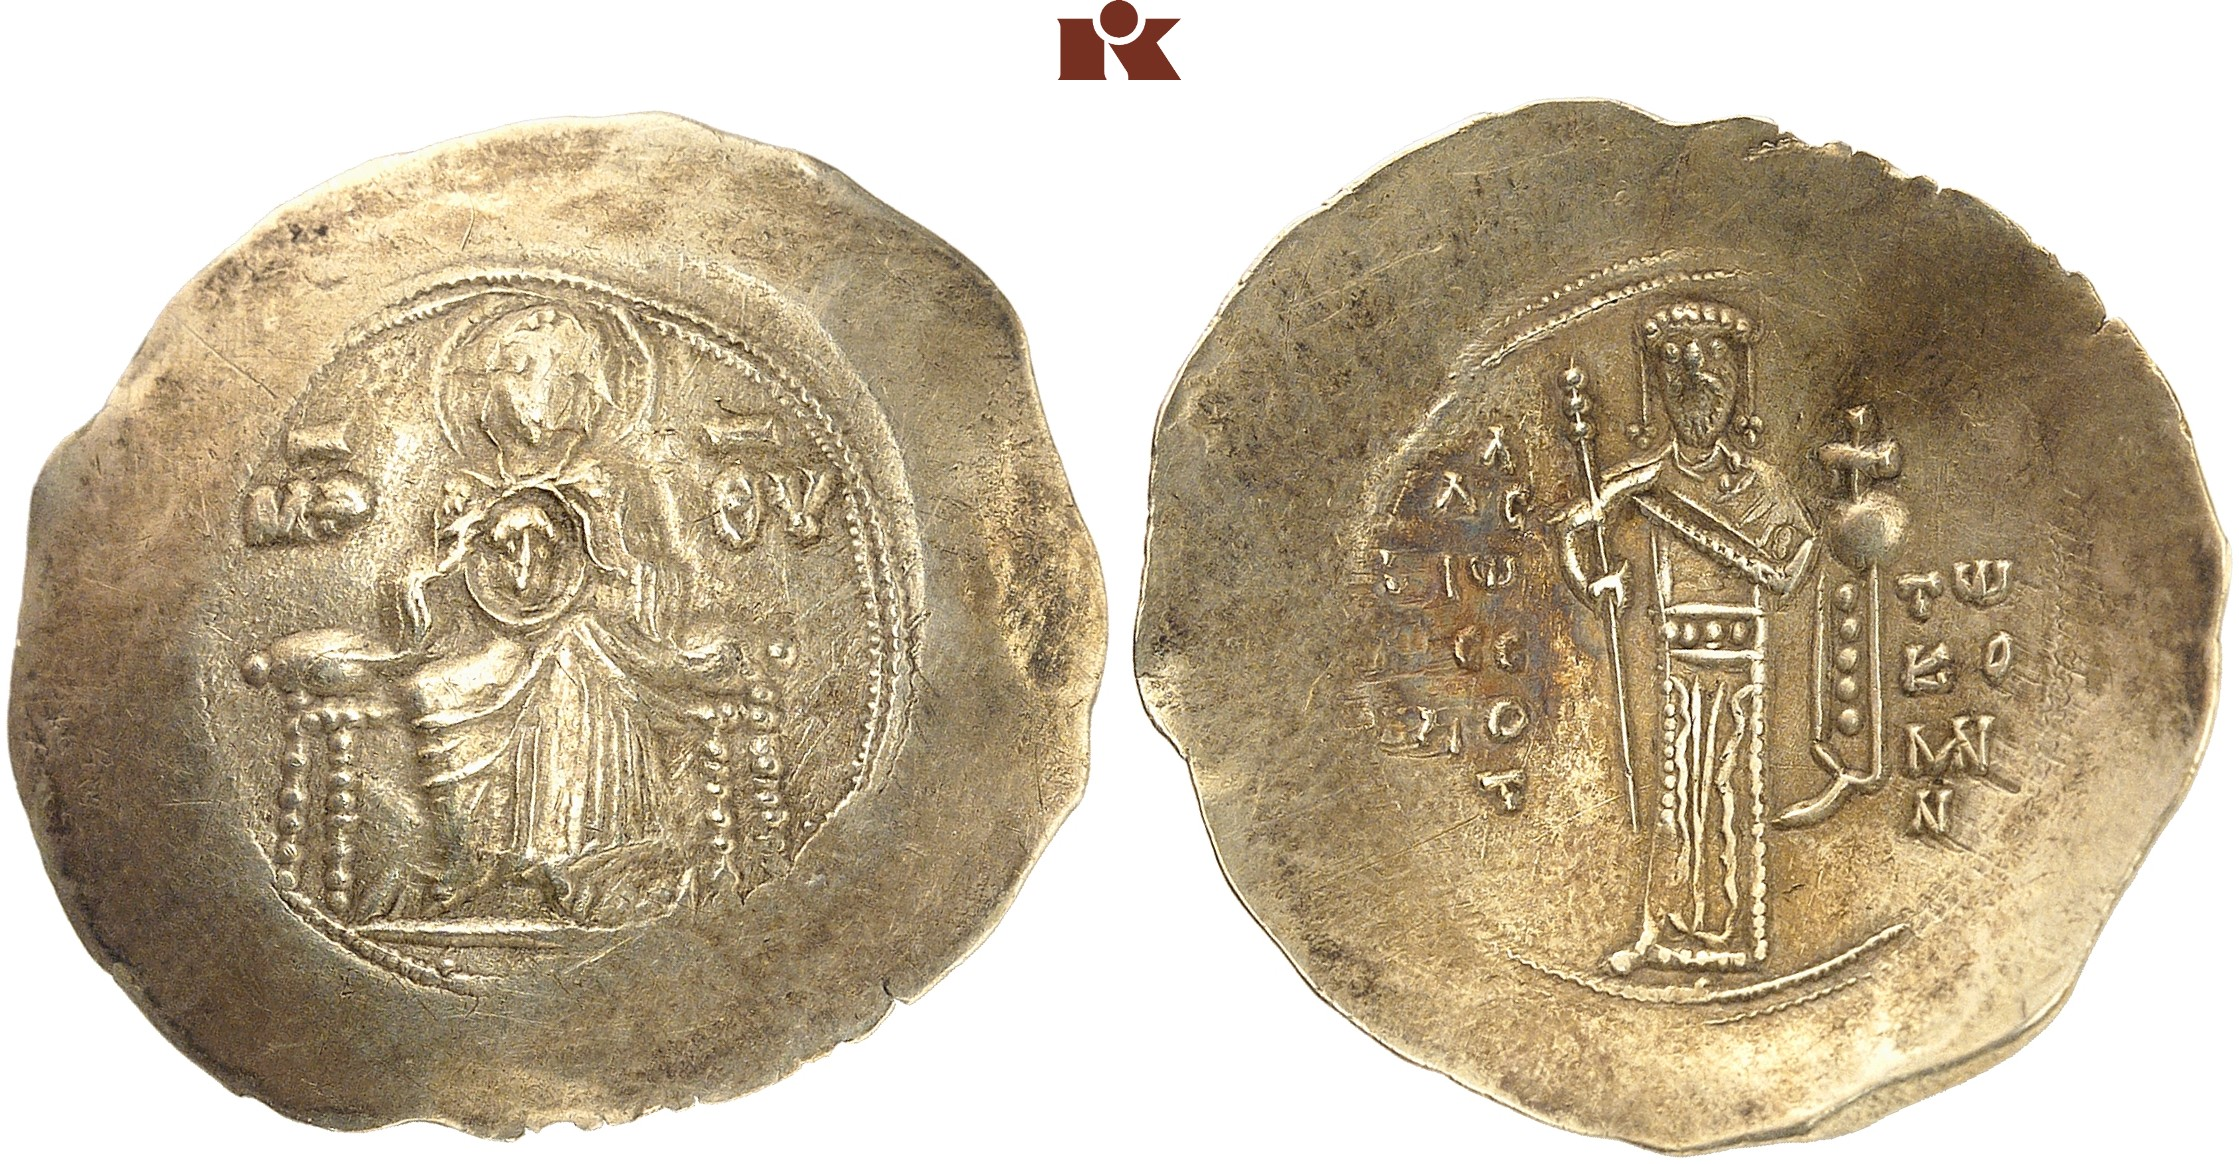 Alexios III of Trebizond